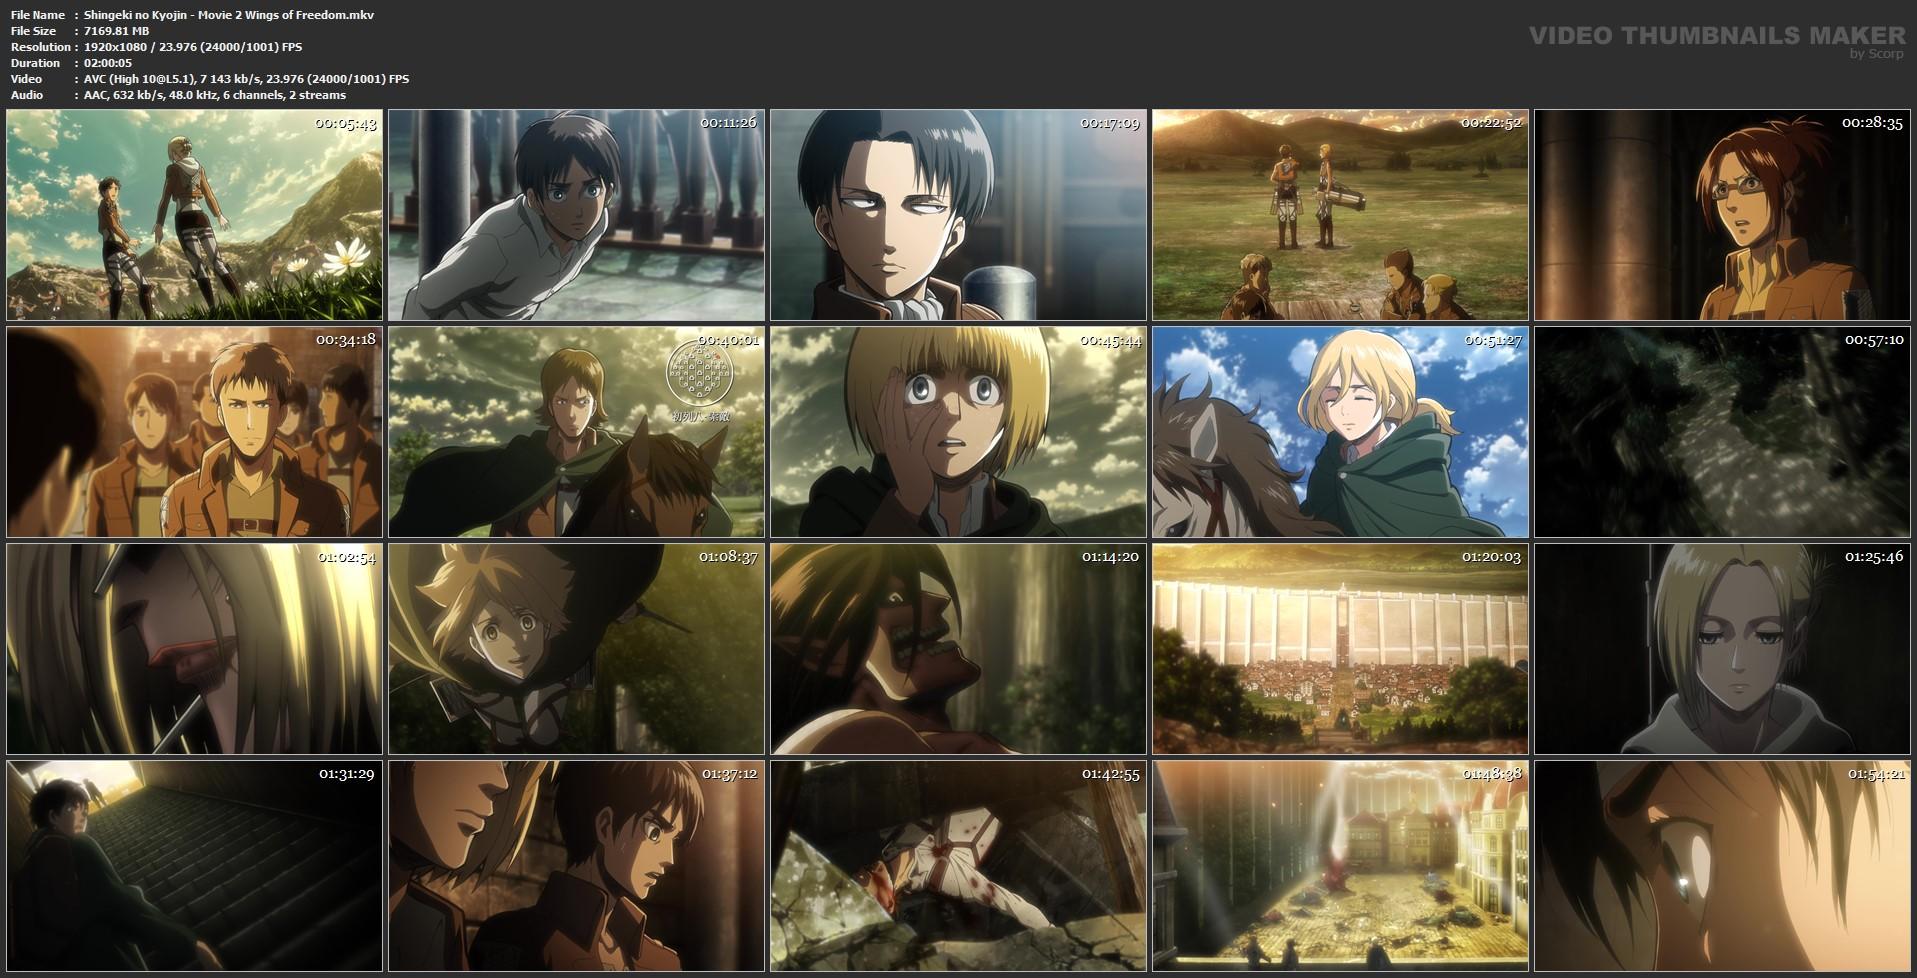 Shingeki-no-Kyojin-Movie-2-Wings-of-Freedom-mkv